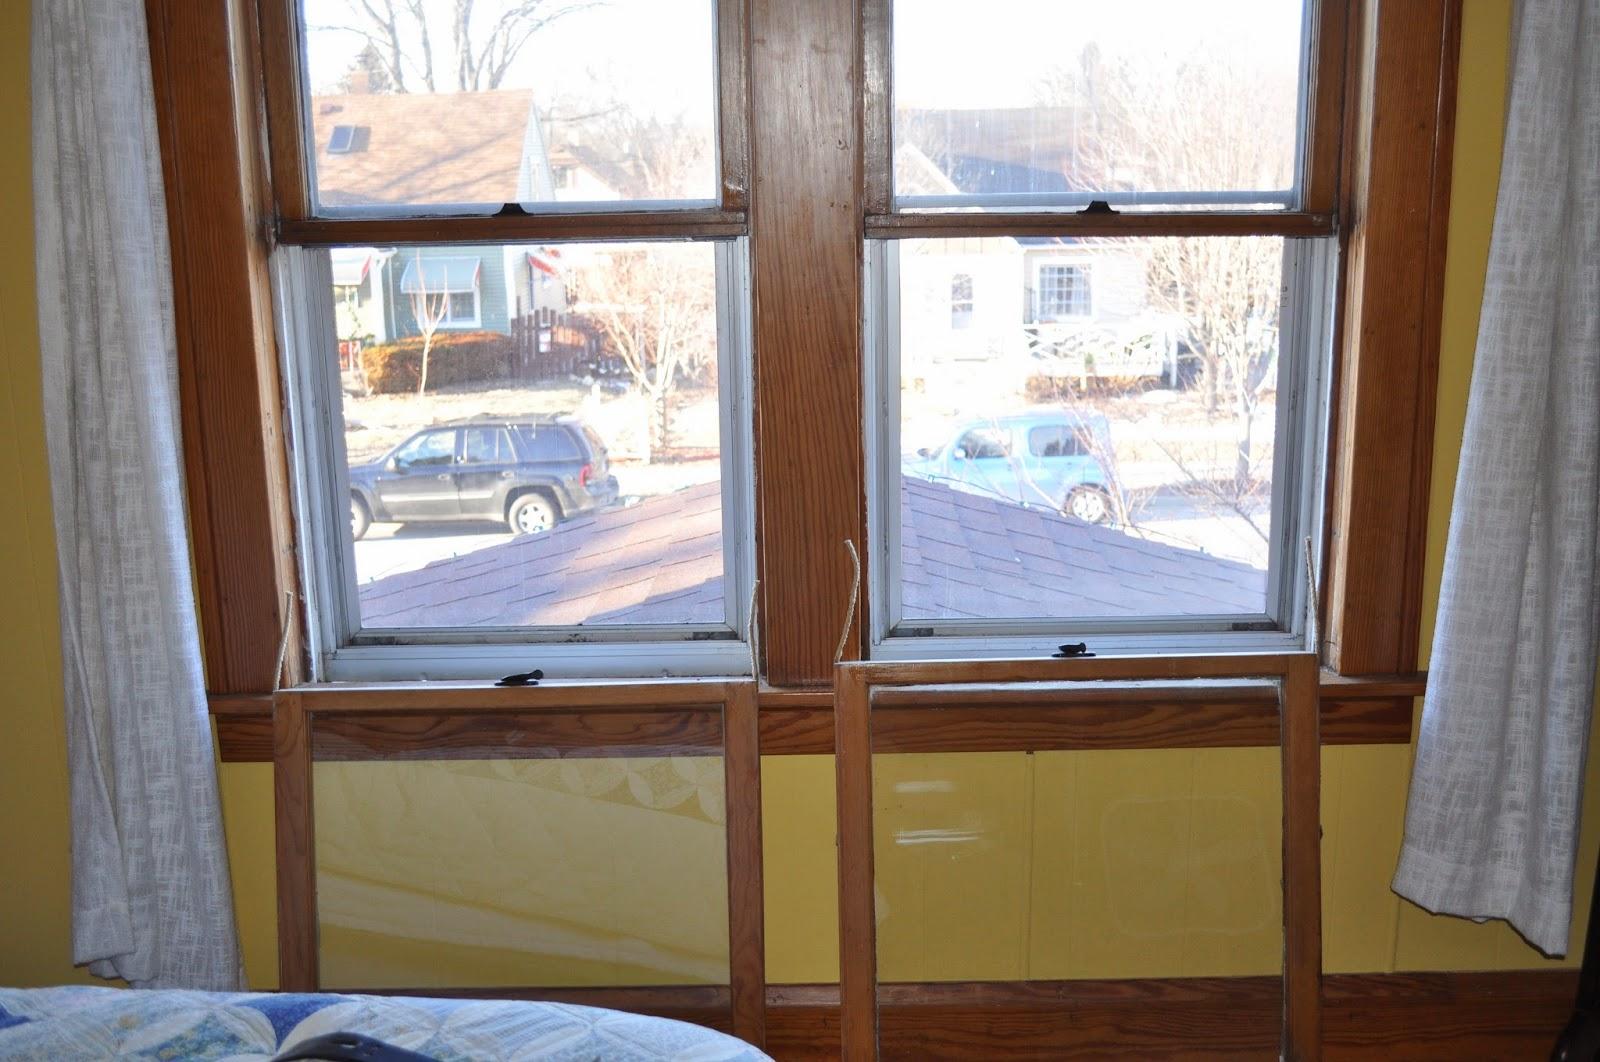 jeld-wen replacement windows, windows, replacement windows, spray foam insulation, insulation windows, caulk, vinyl windows